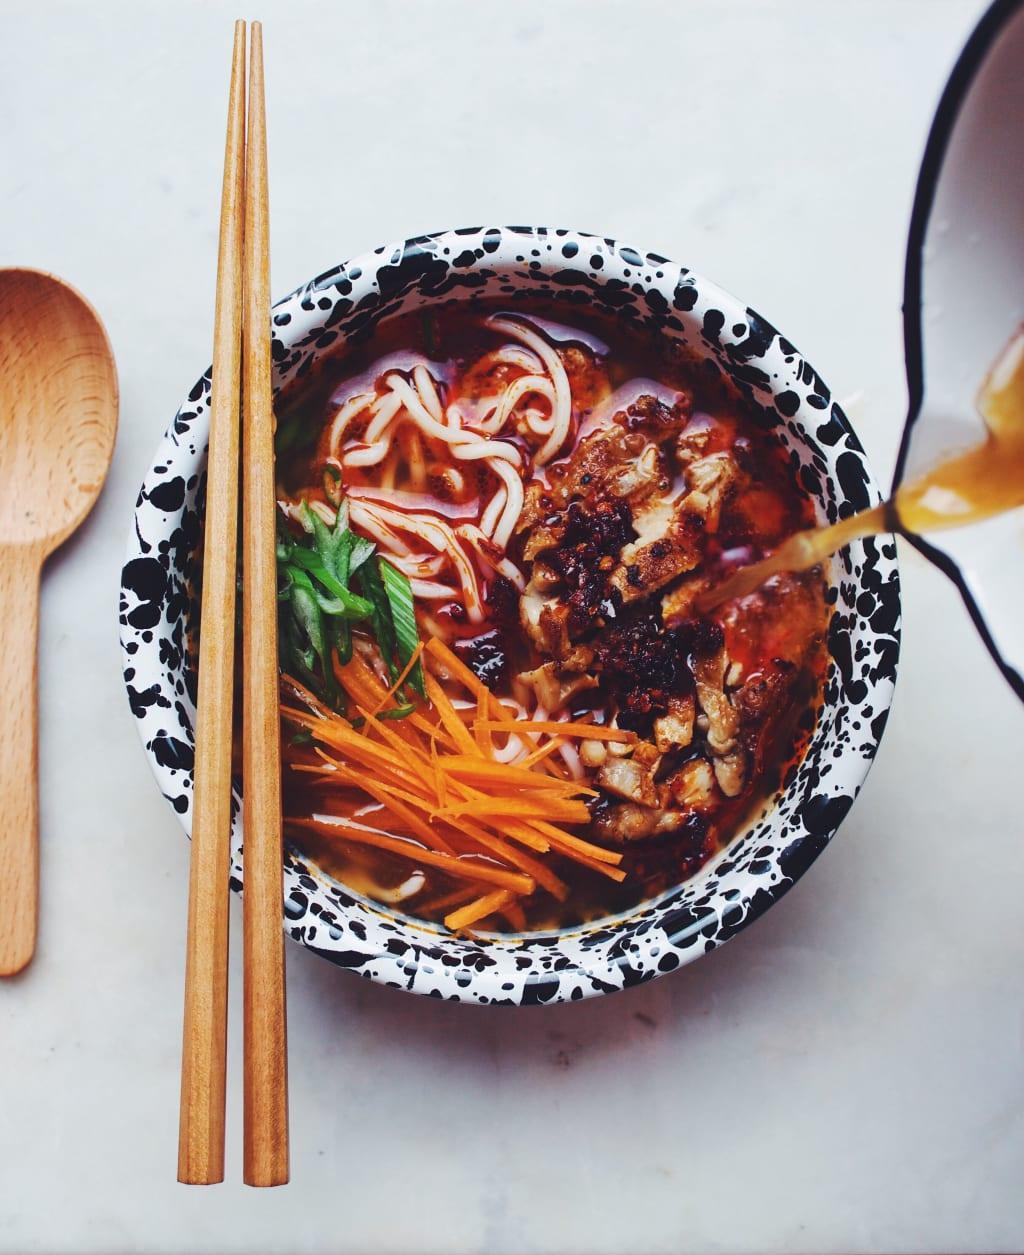 10 Cool Ways to Make Ramen Taste Better